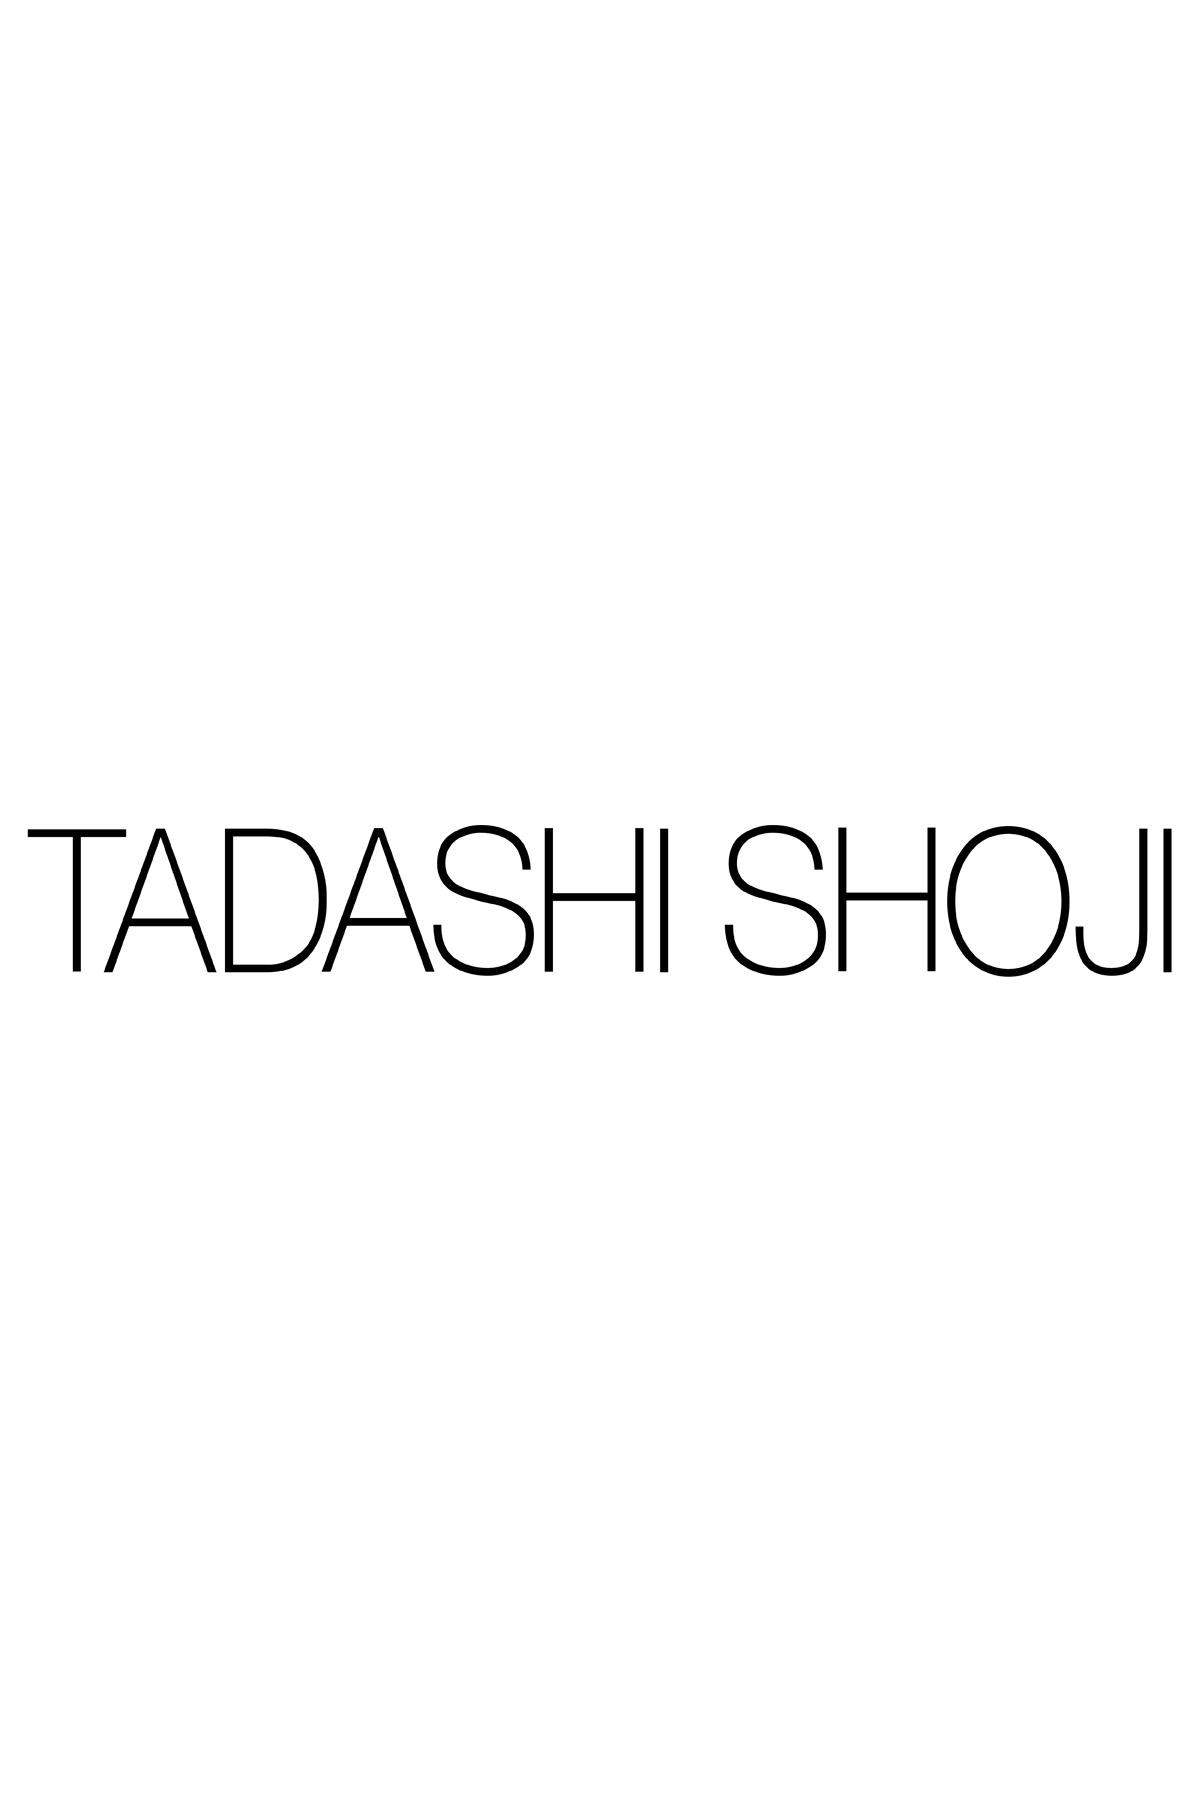 Tadashi Shoji - Paillette Embroidered Tulle 3/4 Sleeve Dress - Detail